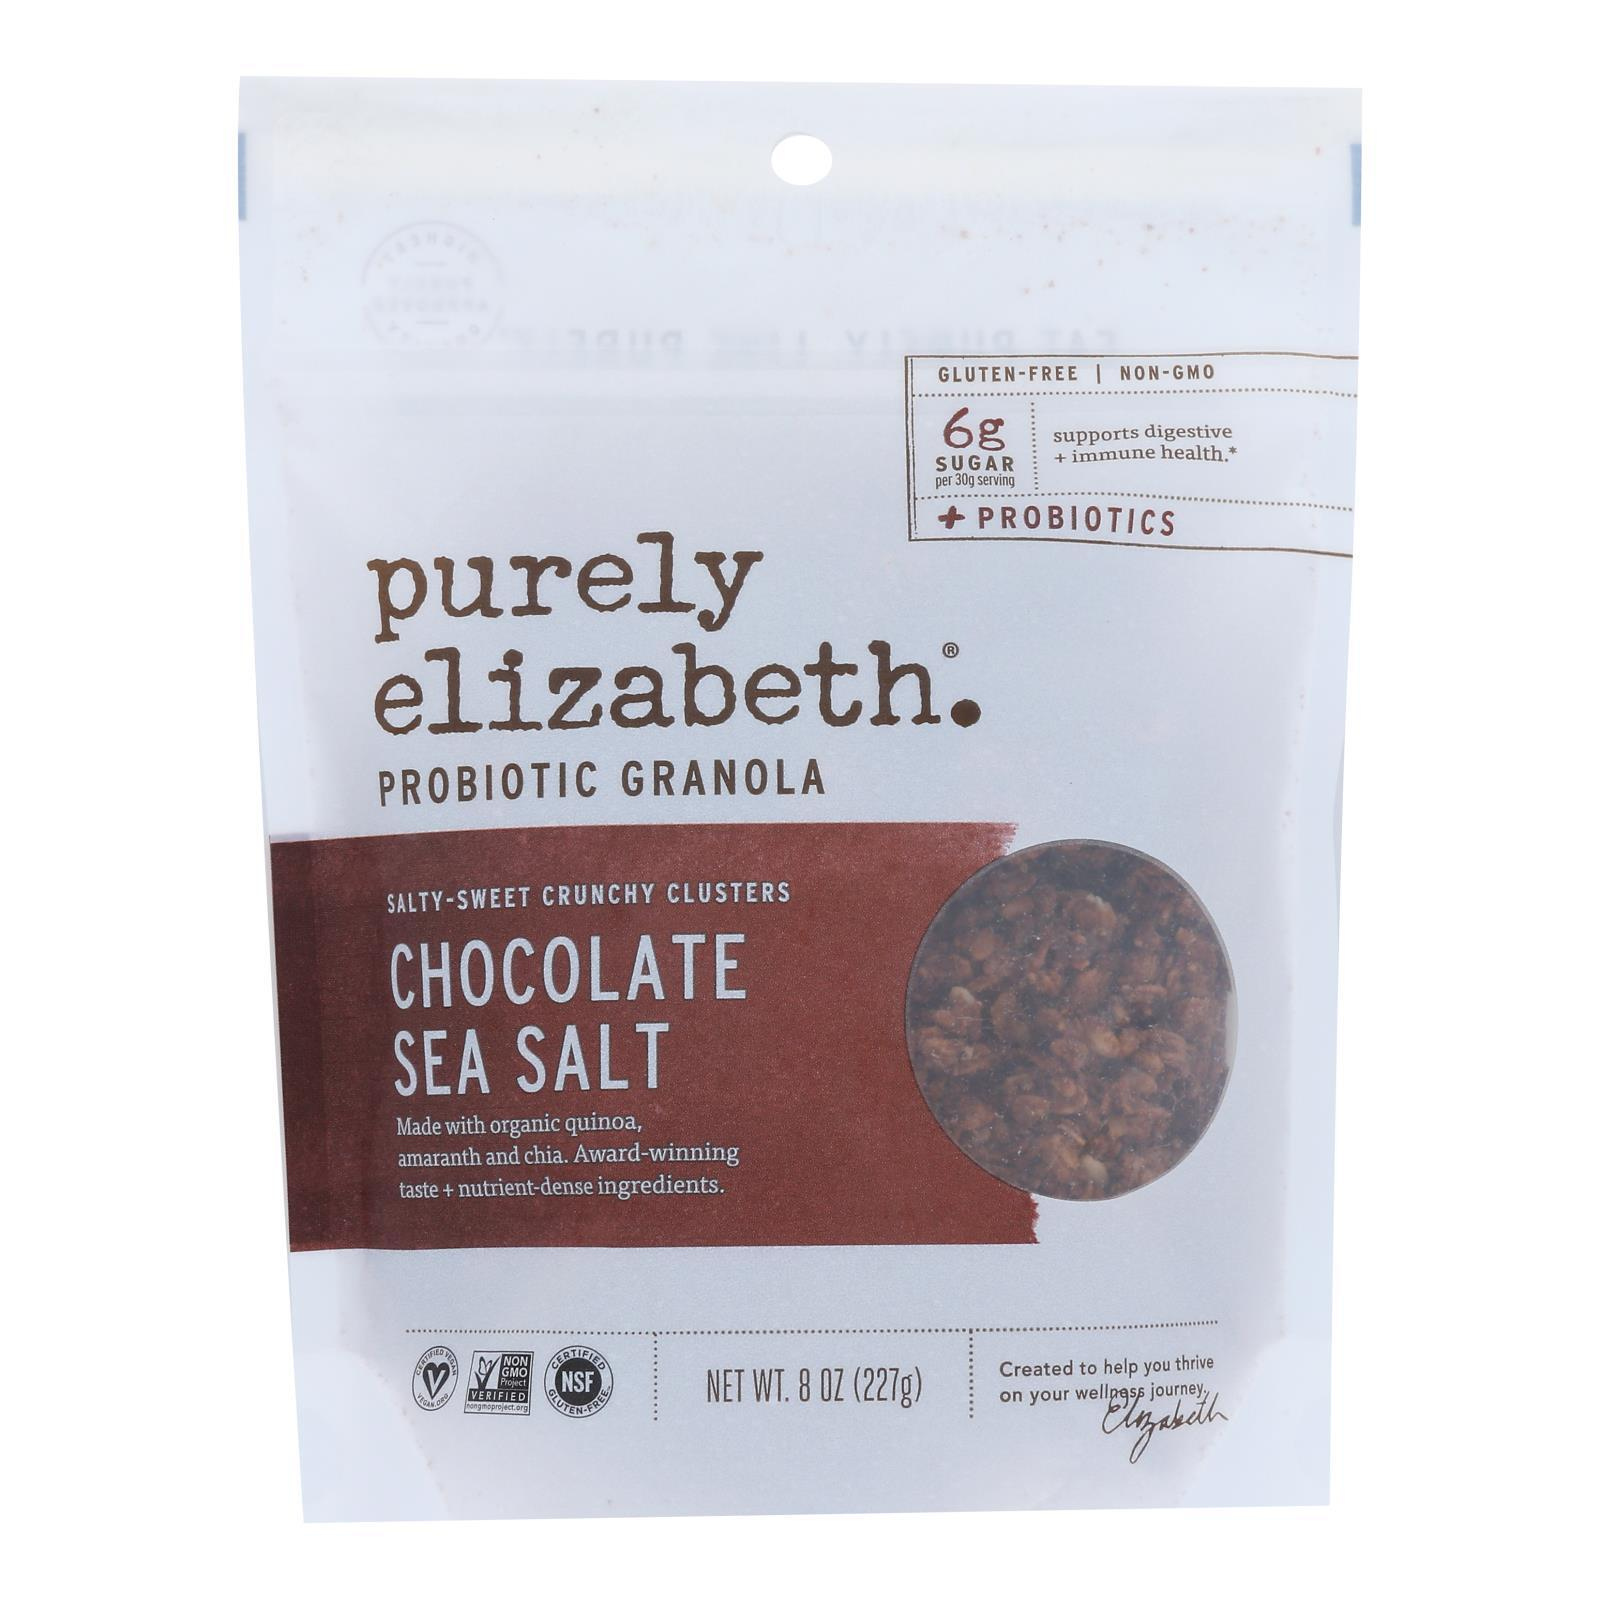 Purely Elizabeth Probiotic Granola - Maple Walnut - Case of 6 - 8 oz.